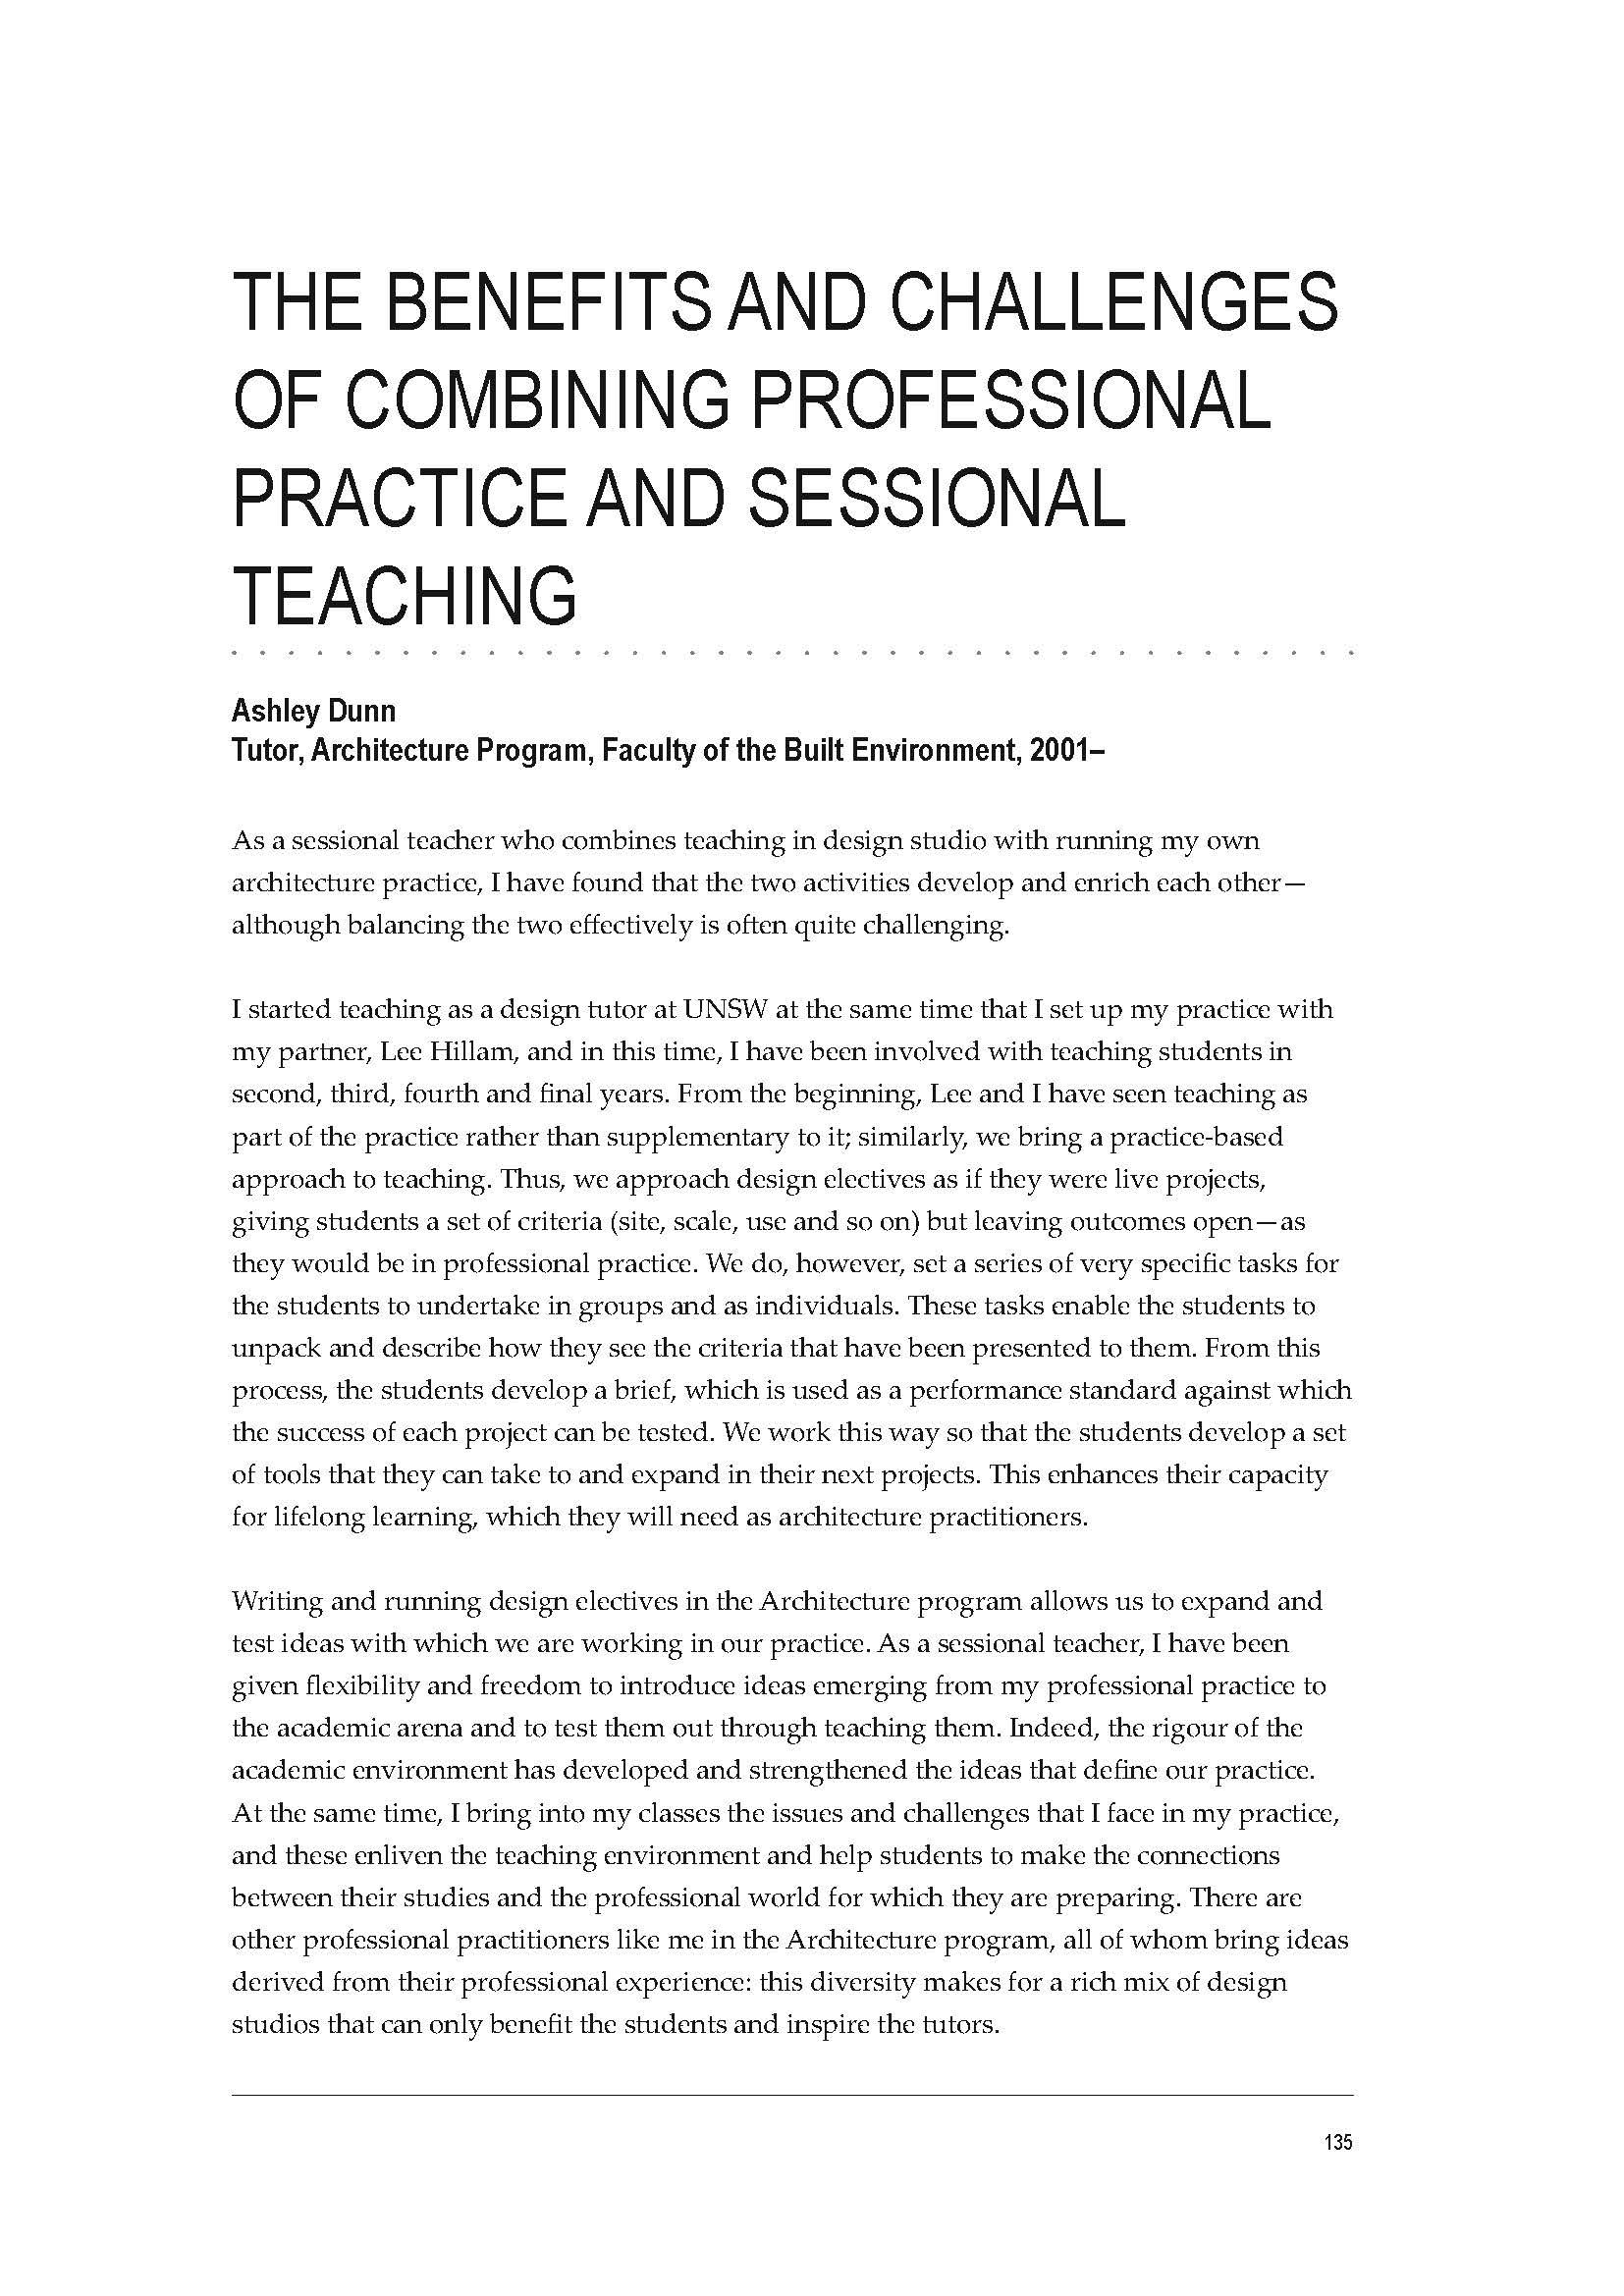 UNSW_Compendium_Issue4_Feb07_Page_6.jpg